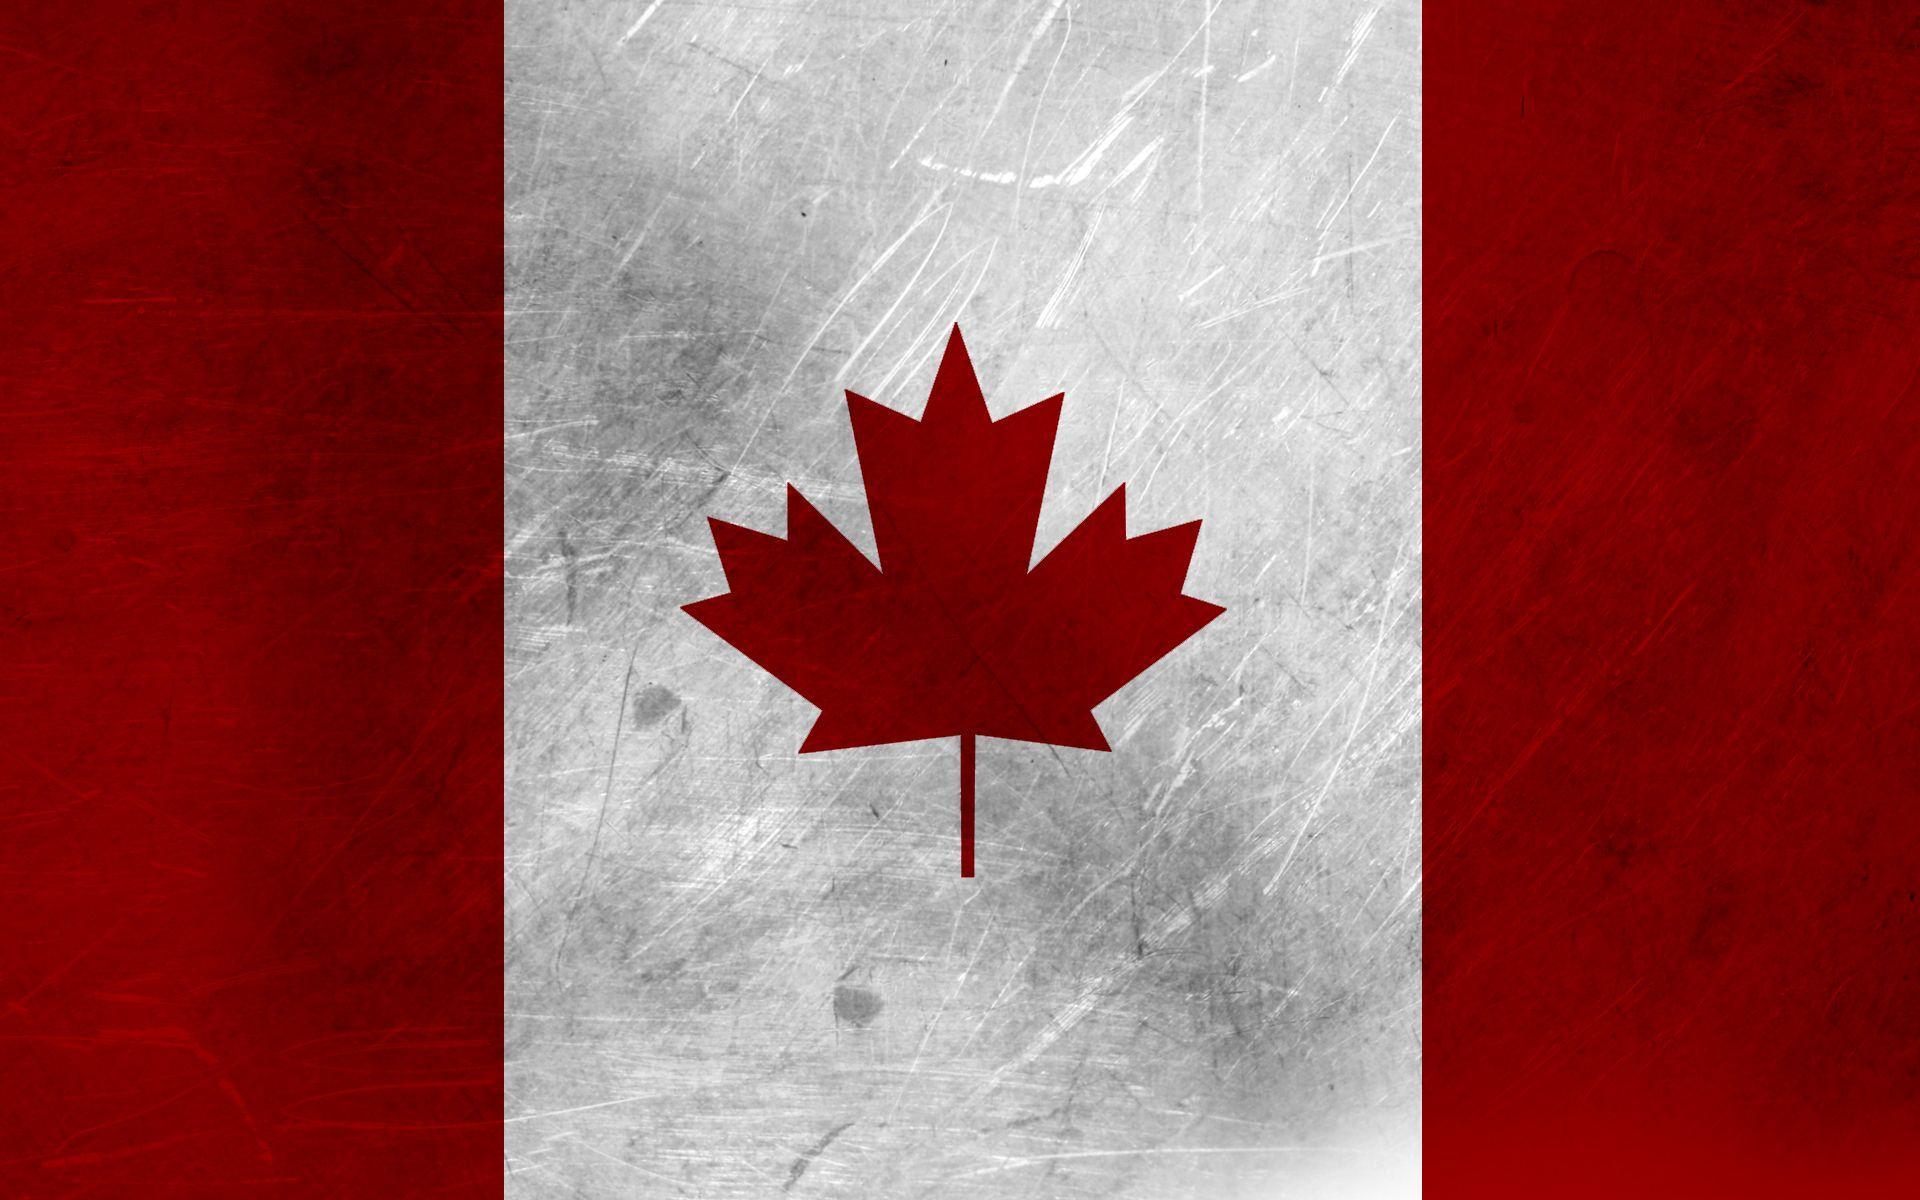 Canada flag wallpapers wallpaper cave - Canada flag wallpaper hd for iphone ...